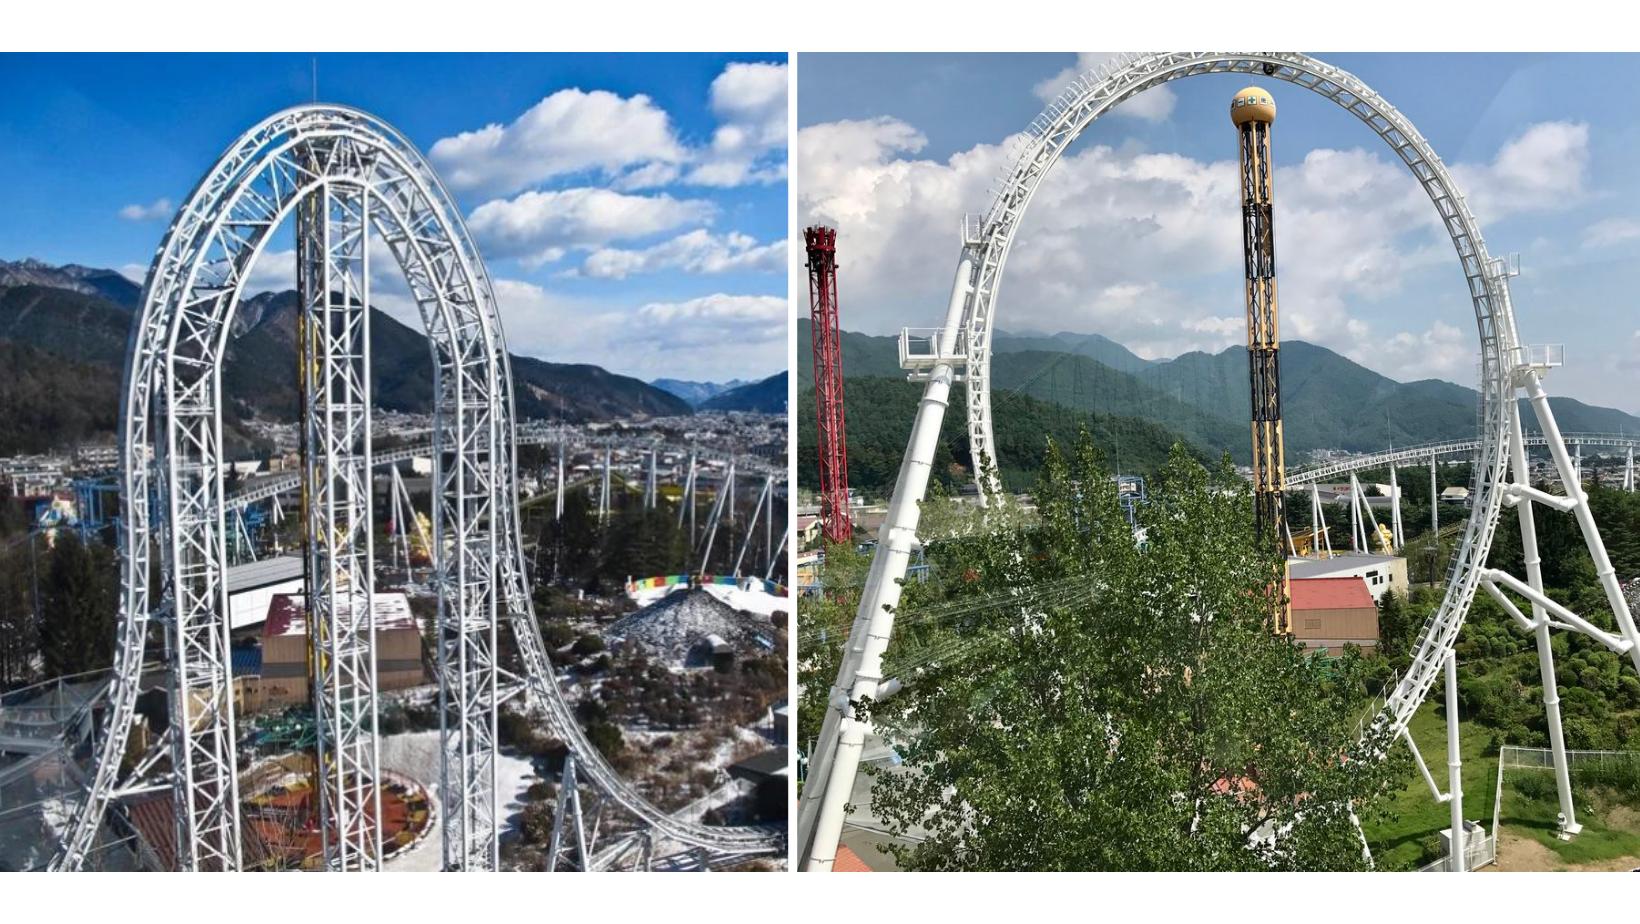 Do Dodonpa rollercoaster shut down